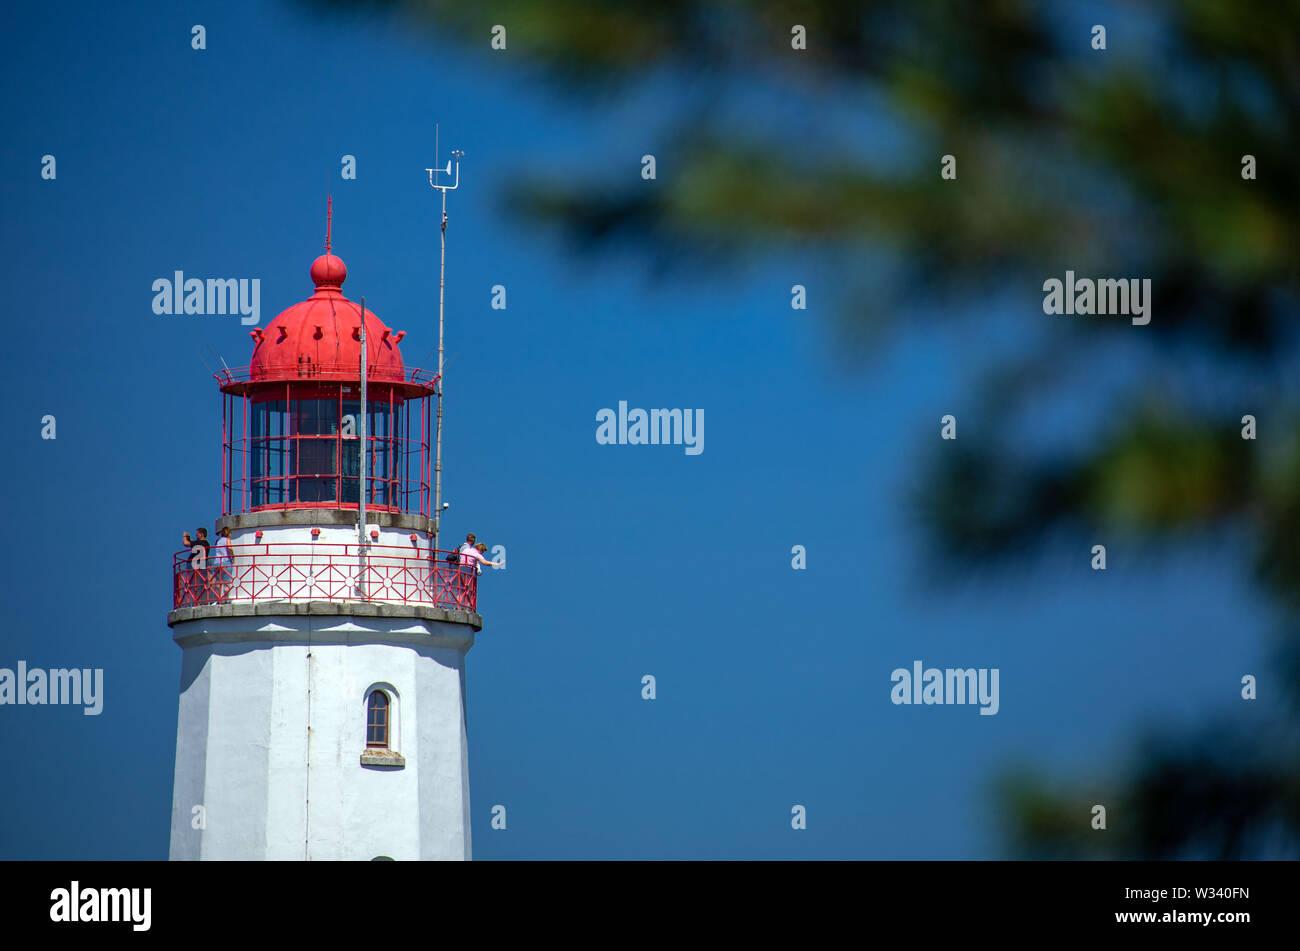 94 7 8 Stock Photos & 94 7 8 Stock Images - Alamy